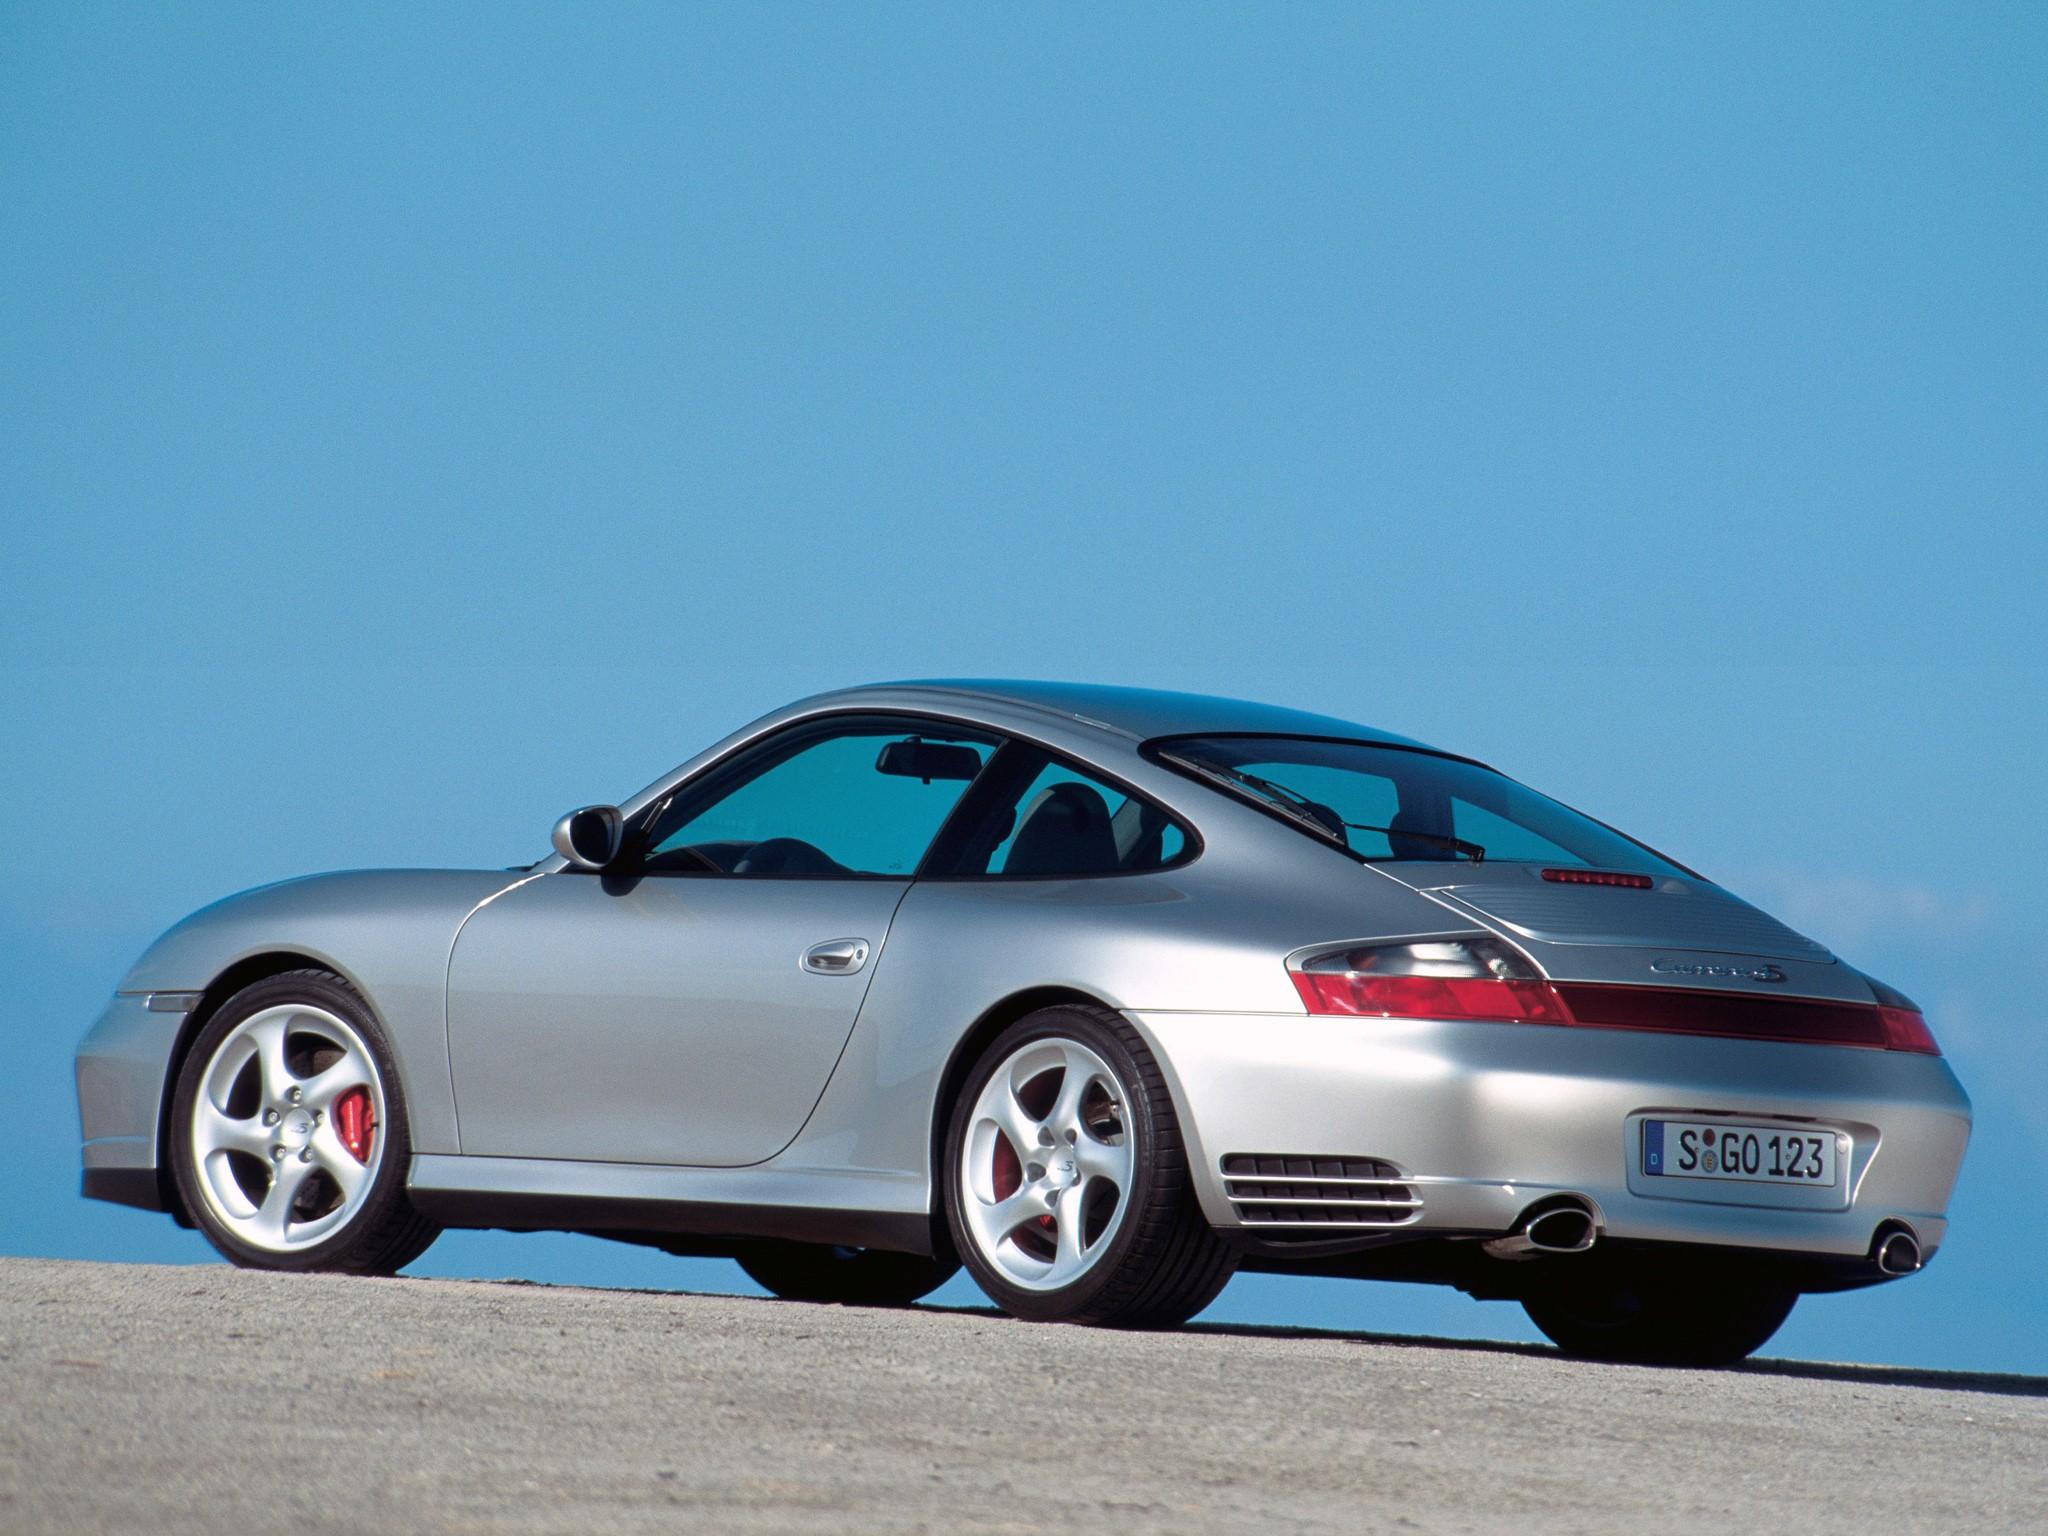 porsche 911 carrera 4s 996 specs 2001 2002 2003 2004 2005 autoevolution. Black Bedroom Furniture Sets. Home Design Ideas